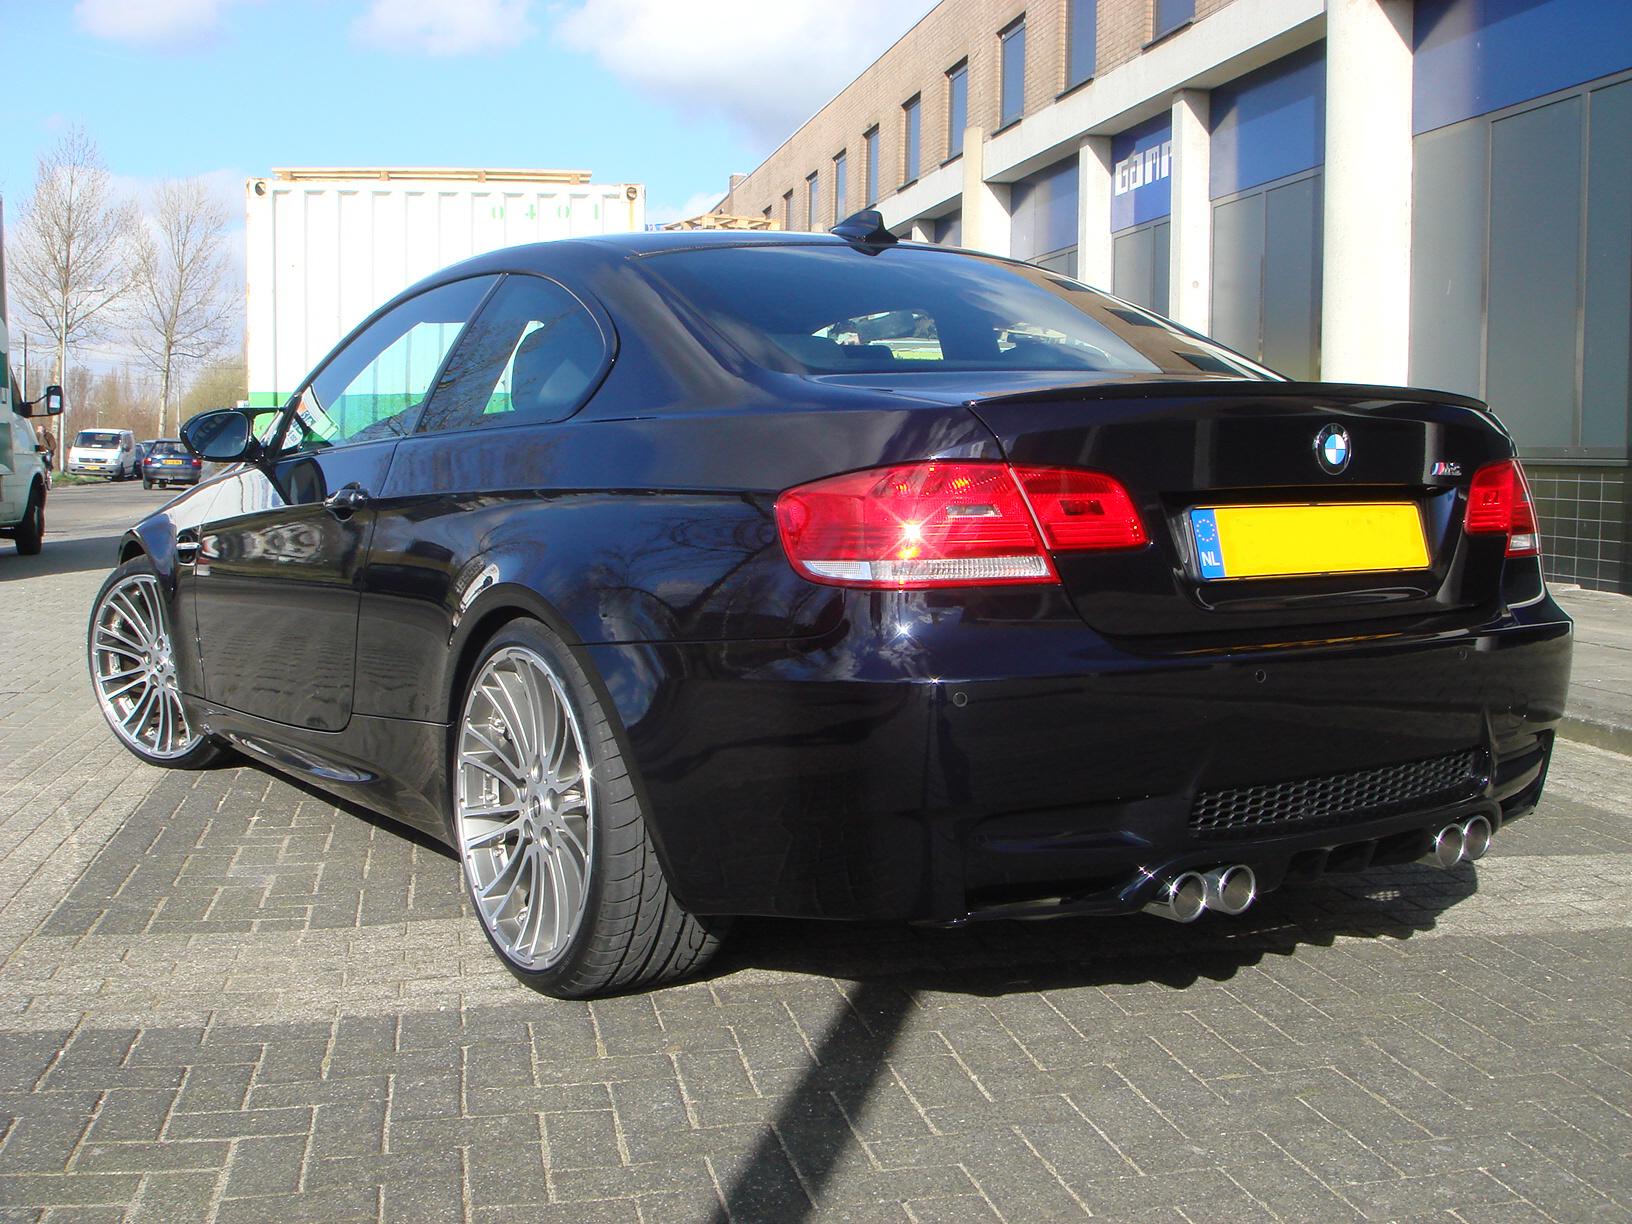 Modded jerez black M3 E92 pics-dsc01953va7.jpg